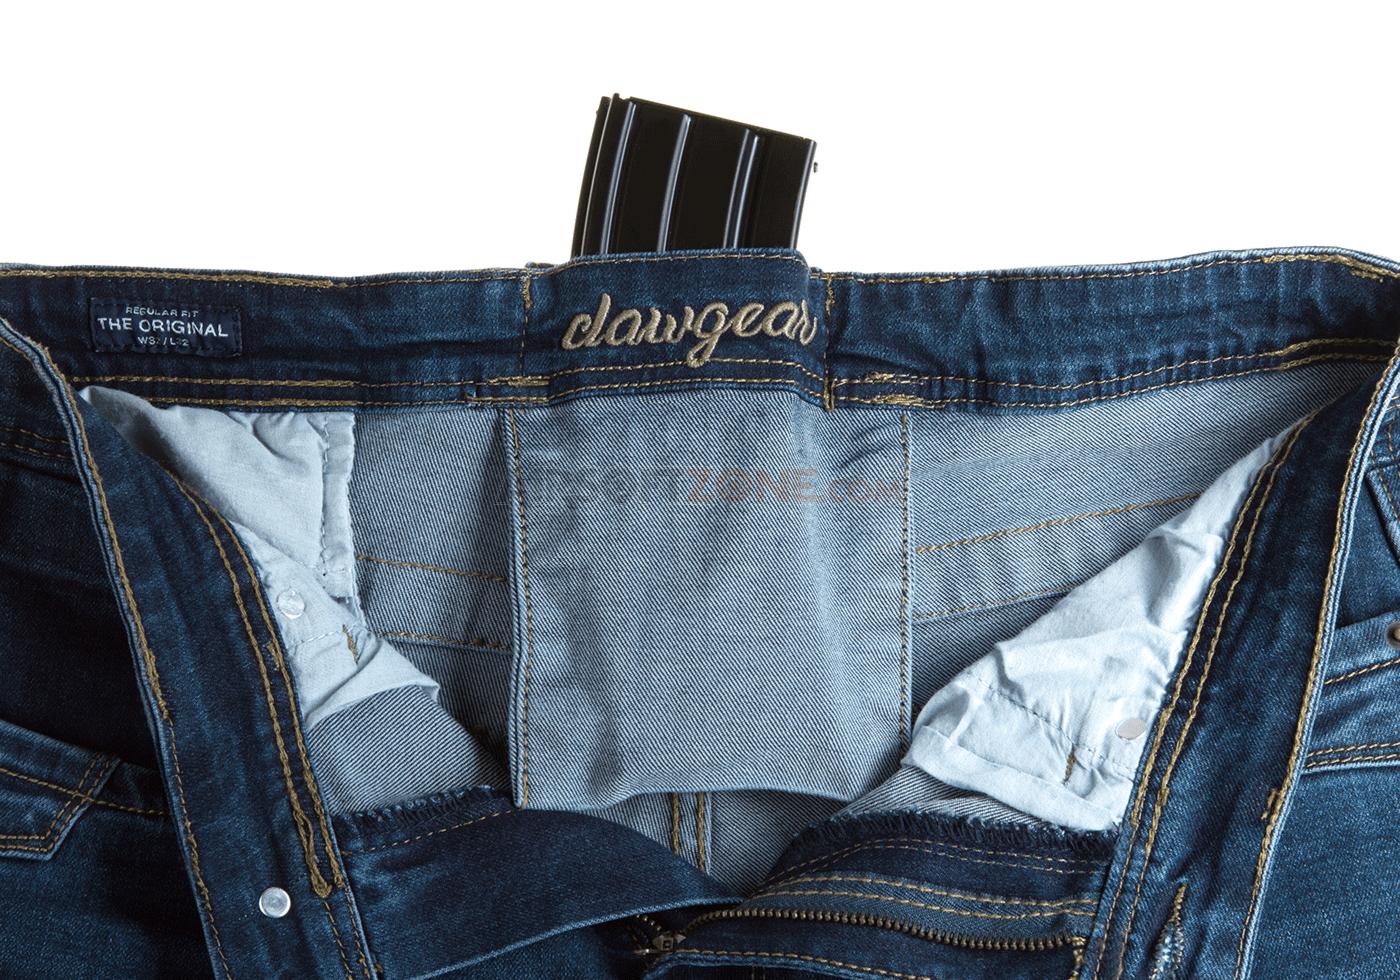 f18efa8143a0 Blue Denim Tactical Flex Jeans Midnight (Clawgear) 36/34 - Jeans - Hosen -  Bekleidung - airsoftzone.at Onlineshop